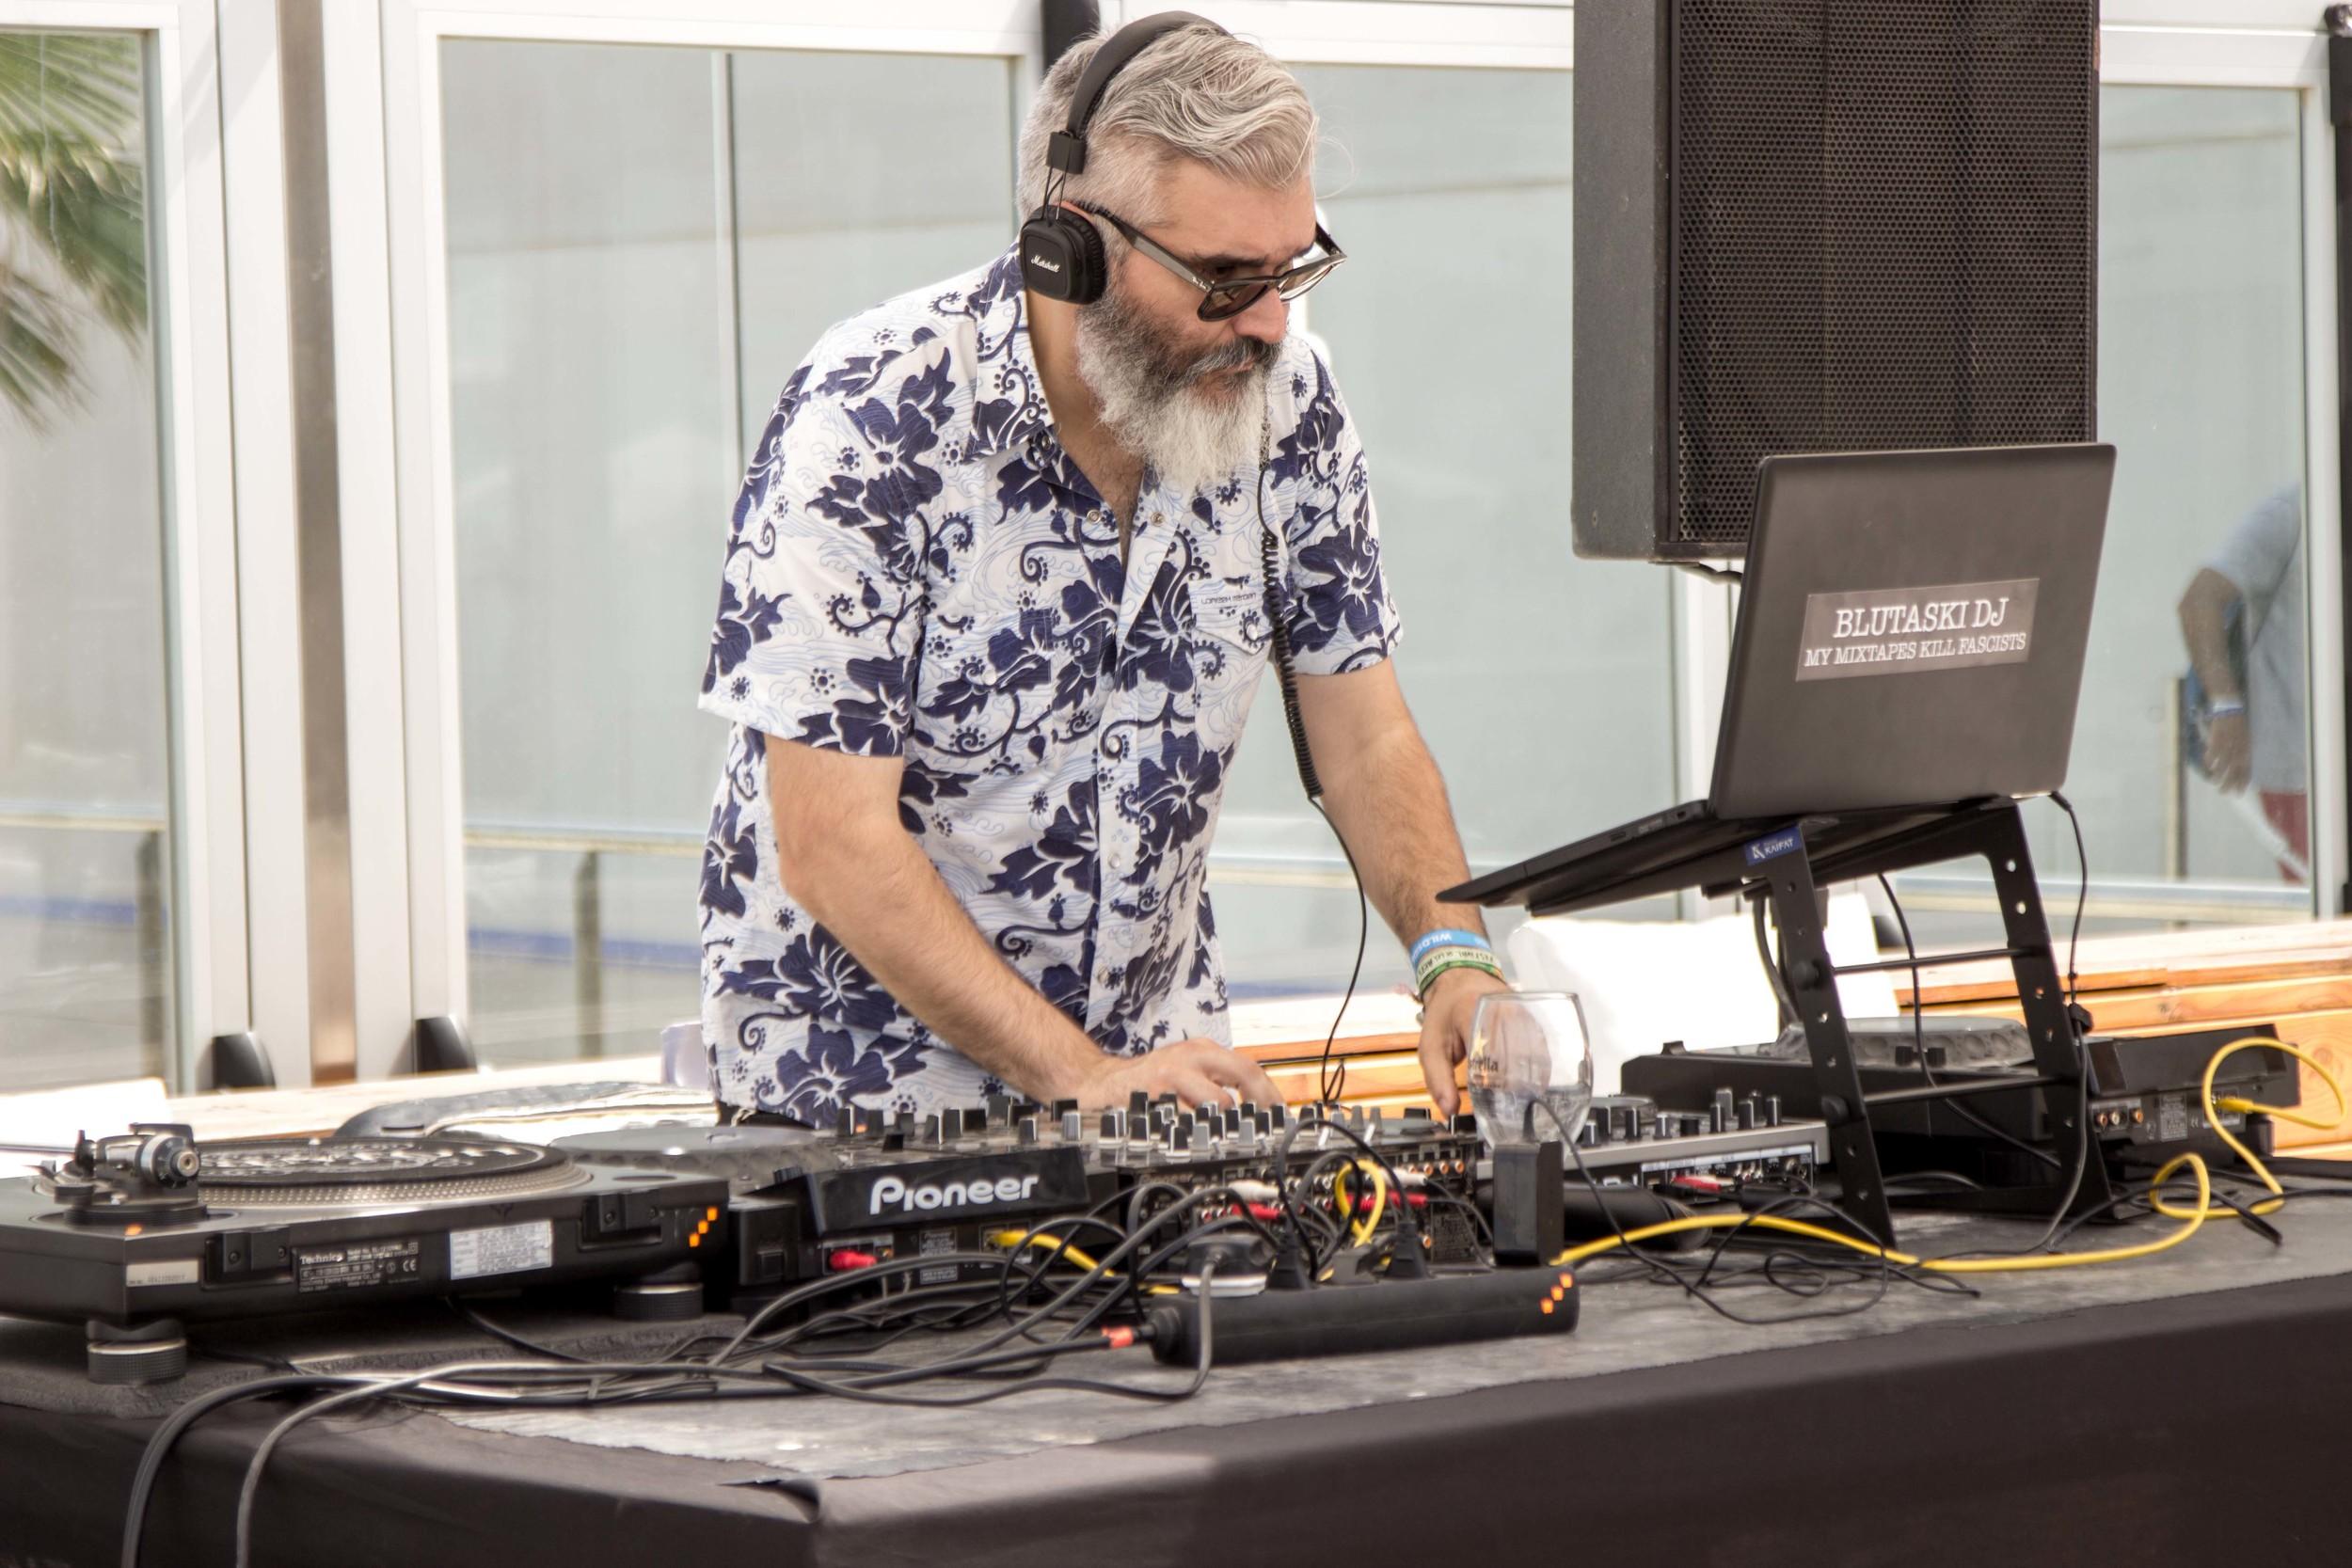 41_Vida Festival_Blutaski DJ_La Daurada.JPG